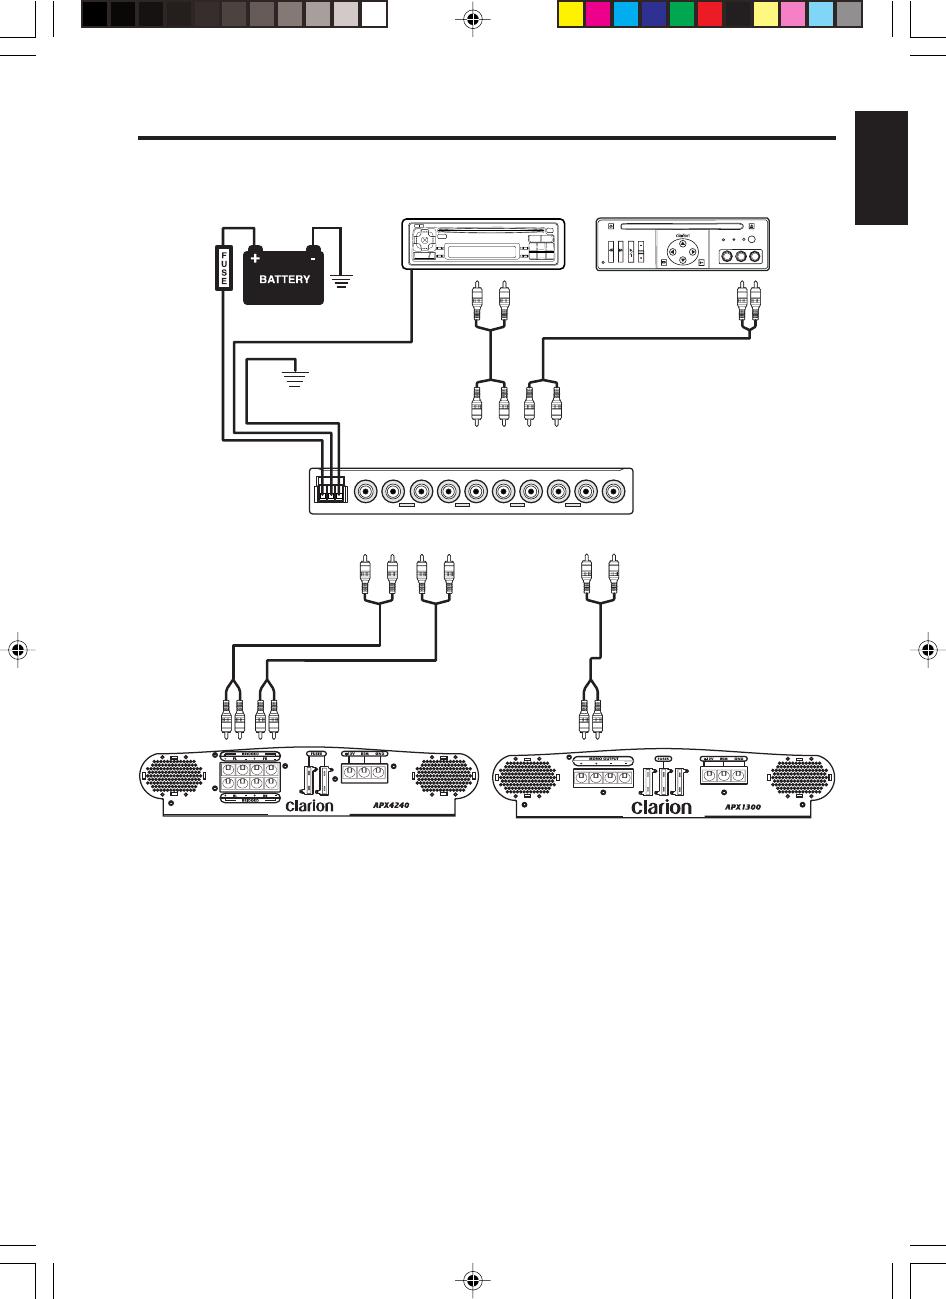 Clarion Eqs746 Owners Manual EQS746_OwnersManual.pmdUserManual.wiki